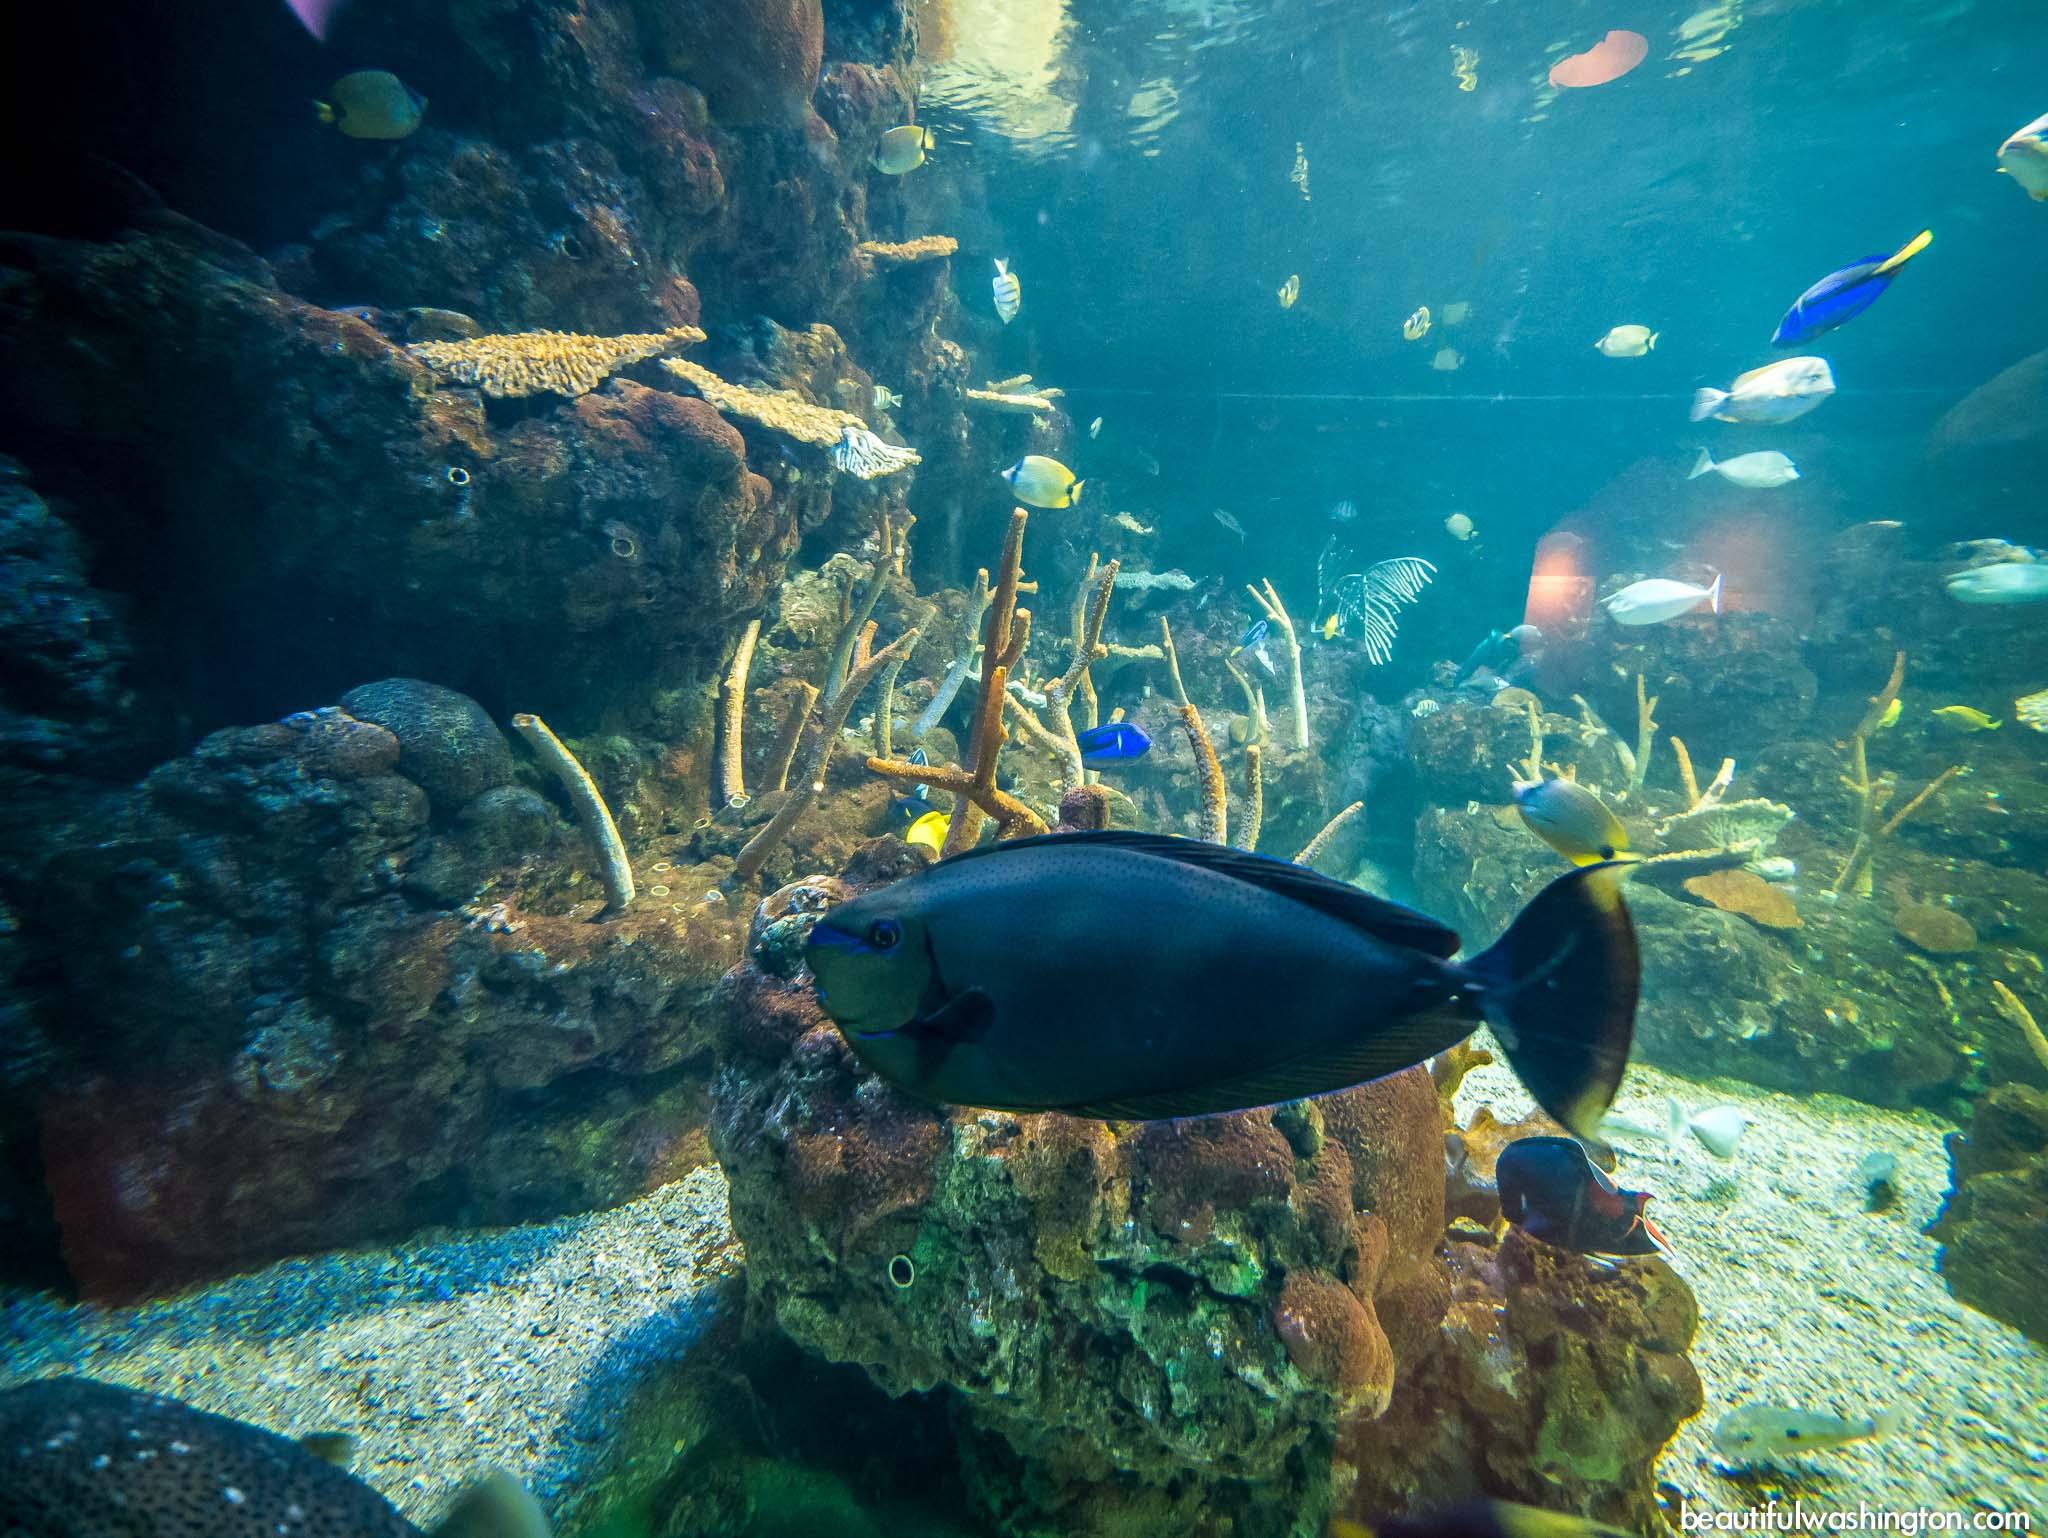 Tank at the Seattle Aquarium (image from Beautiful Washington)